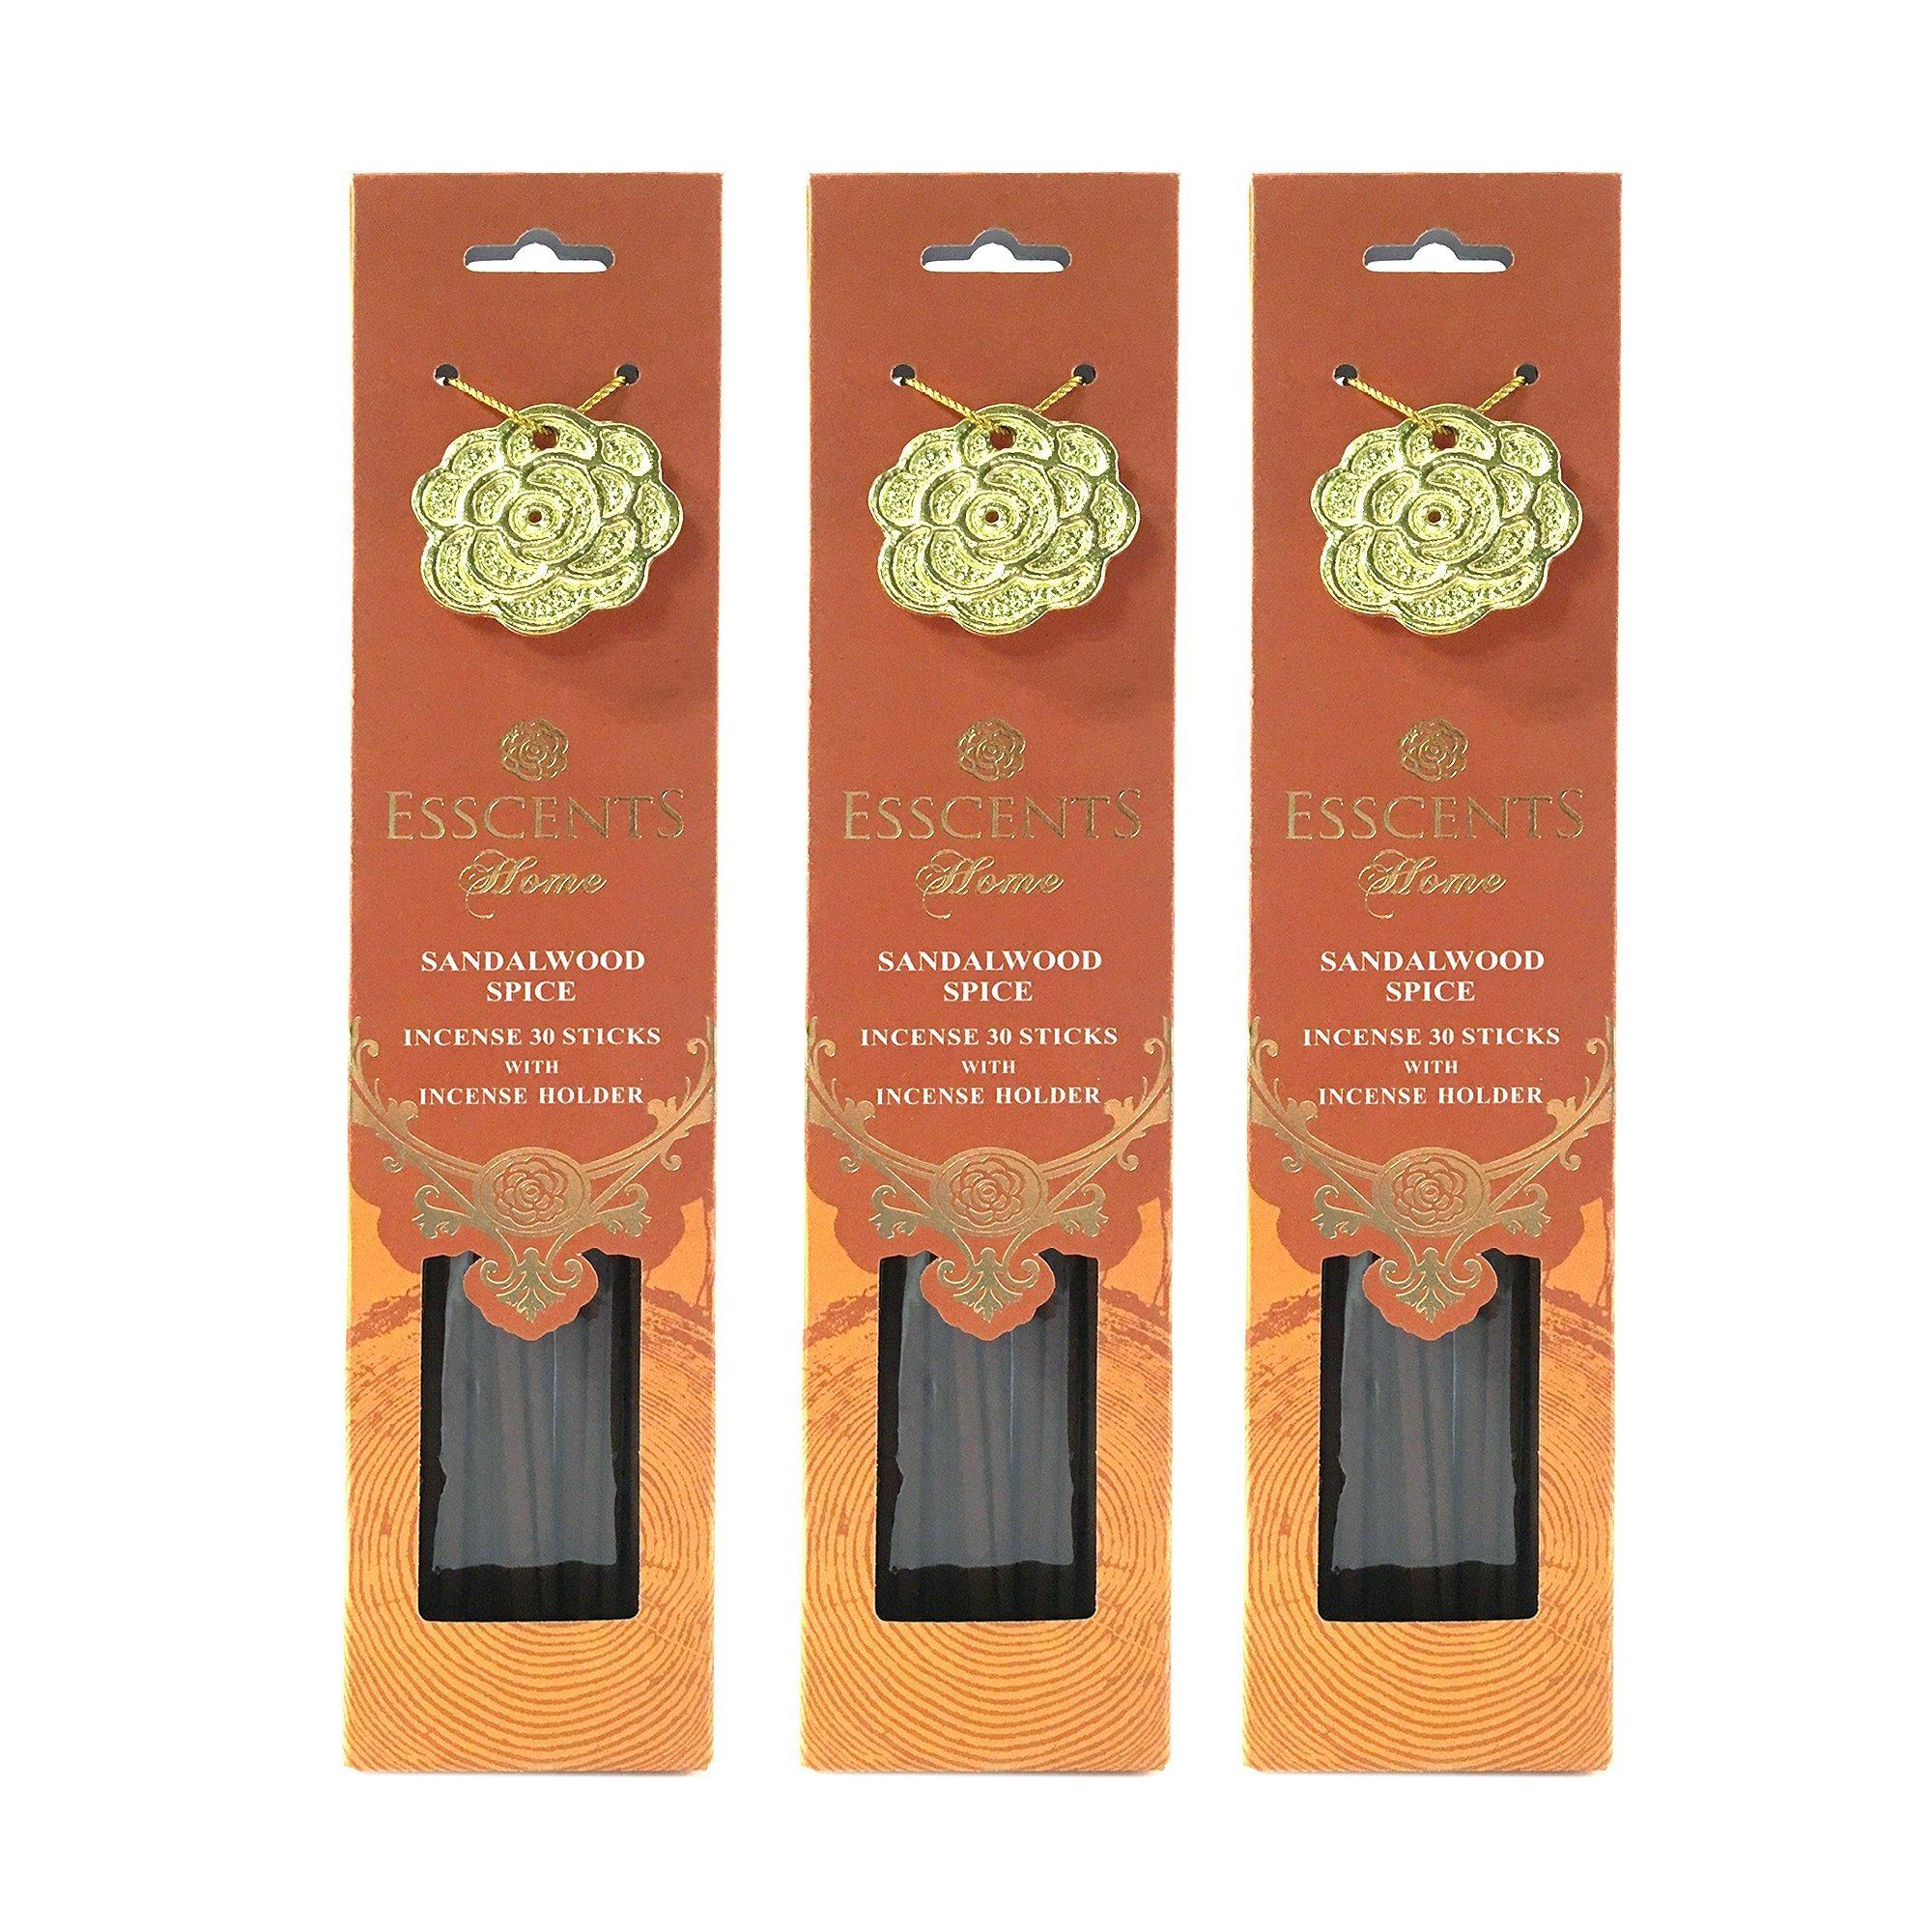 Esscents Home 90 Sticks Premium Incense with 3 Metal Incense Holders - Jasmine Tea, Rose Geranium, Sandalwood Spice, Lavender Rosemary (Sandalwood Spice)